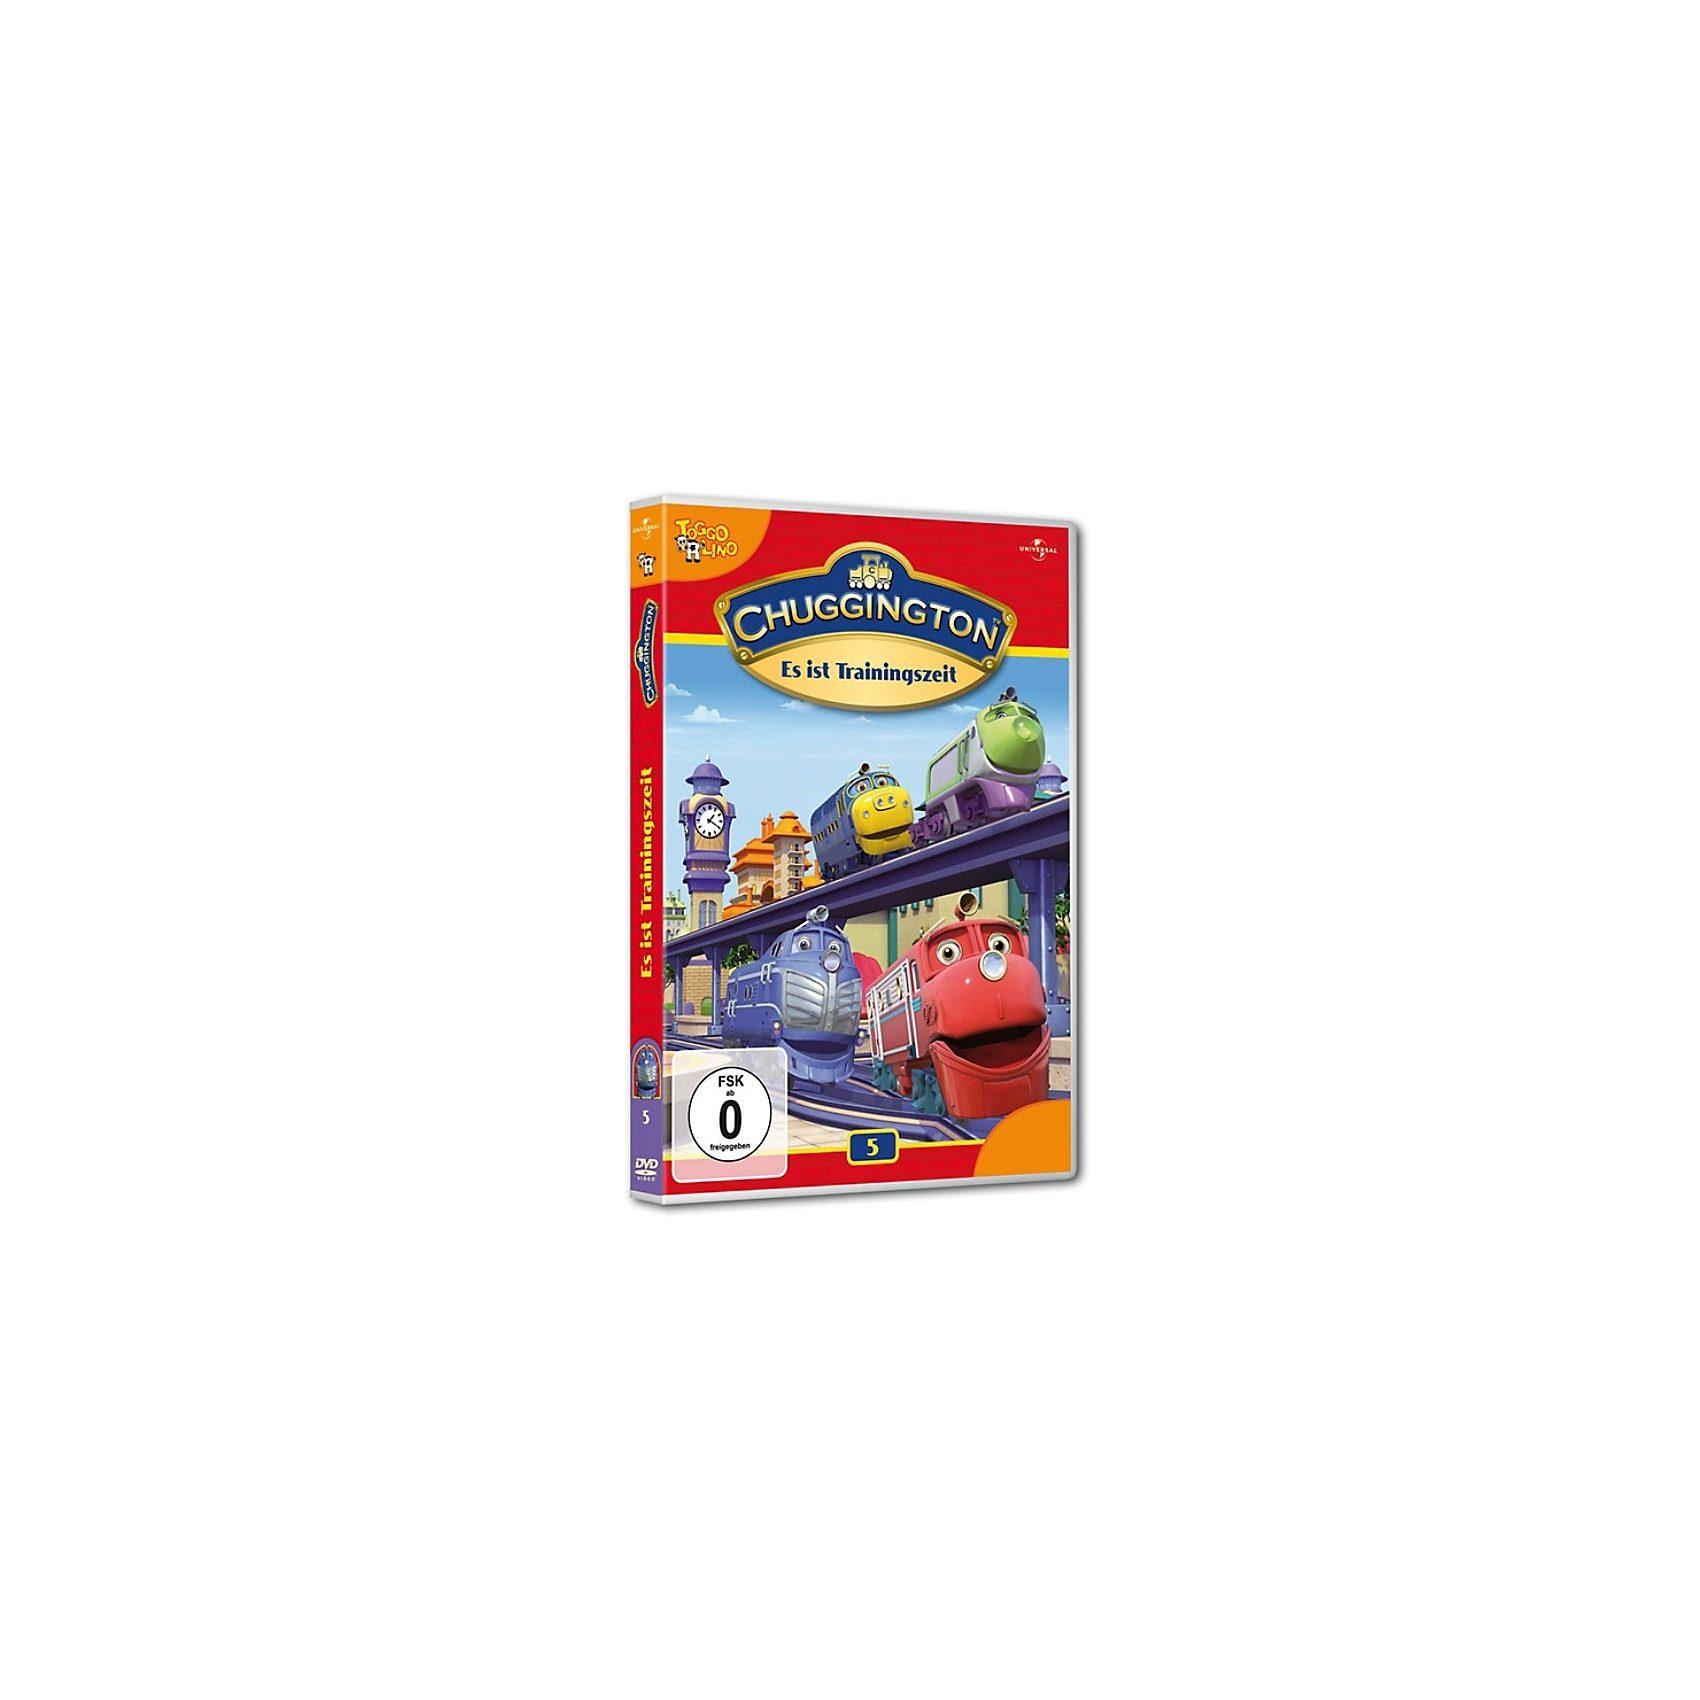 Universal DVD Chuggington 05 - Es ist Trainingszeit